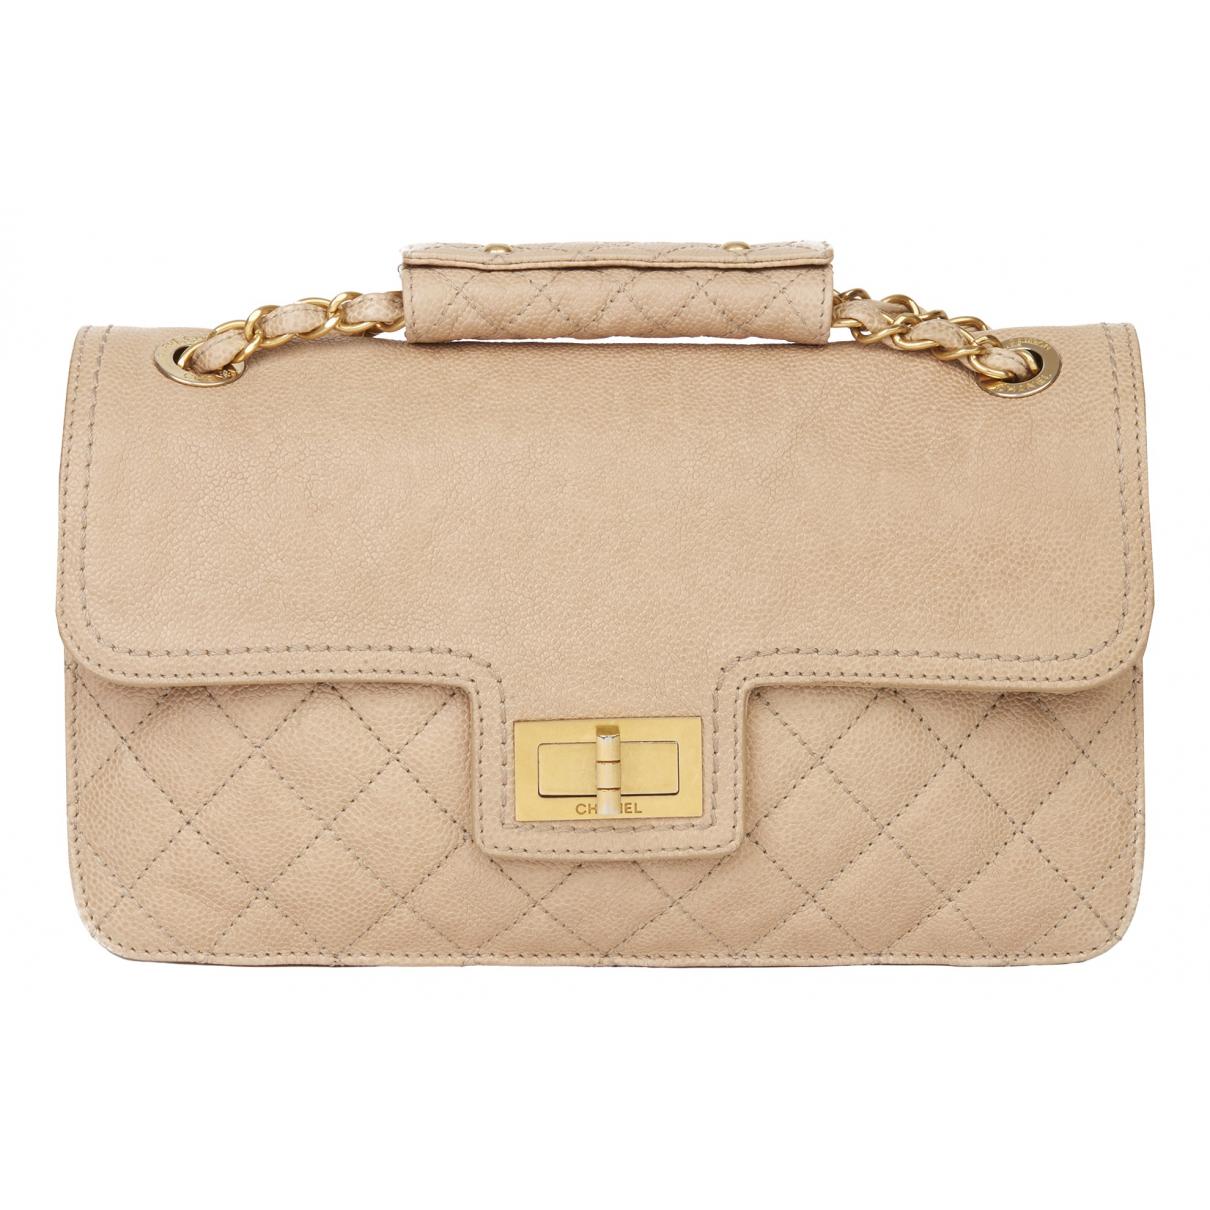 Chanel 2.55 Handtasche in  Beige Leder